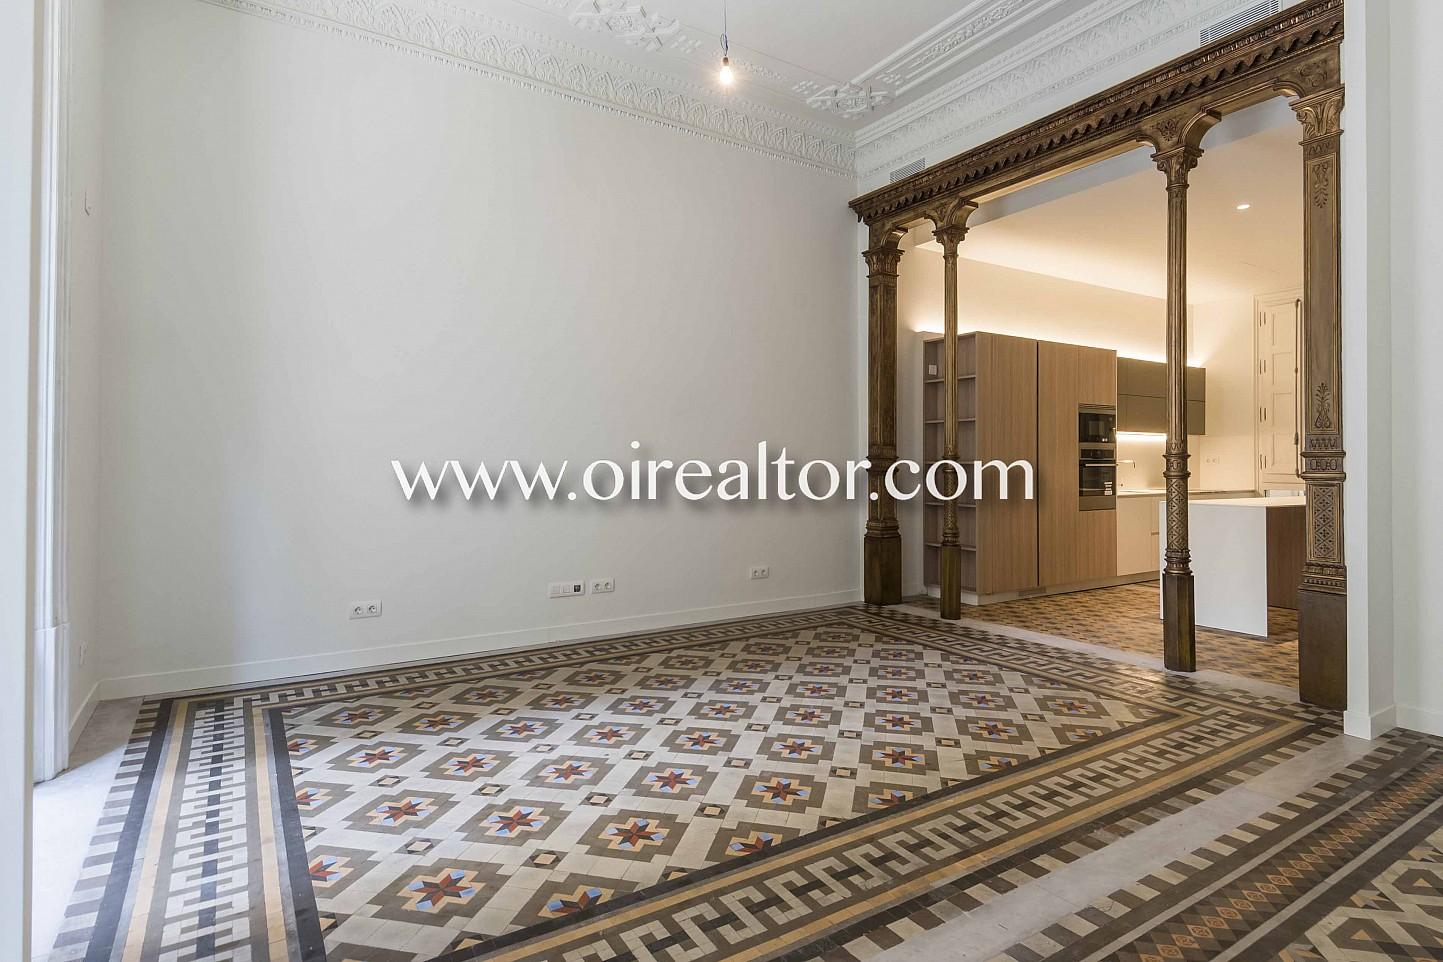 suelo de mosaico, mosaico, salón comedor, salón, comedor, balcón salón con balcón, vistas a la ciudad